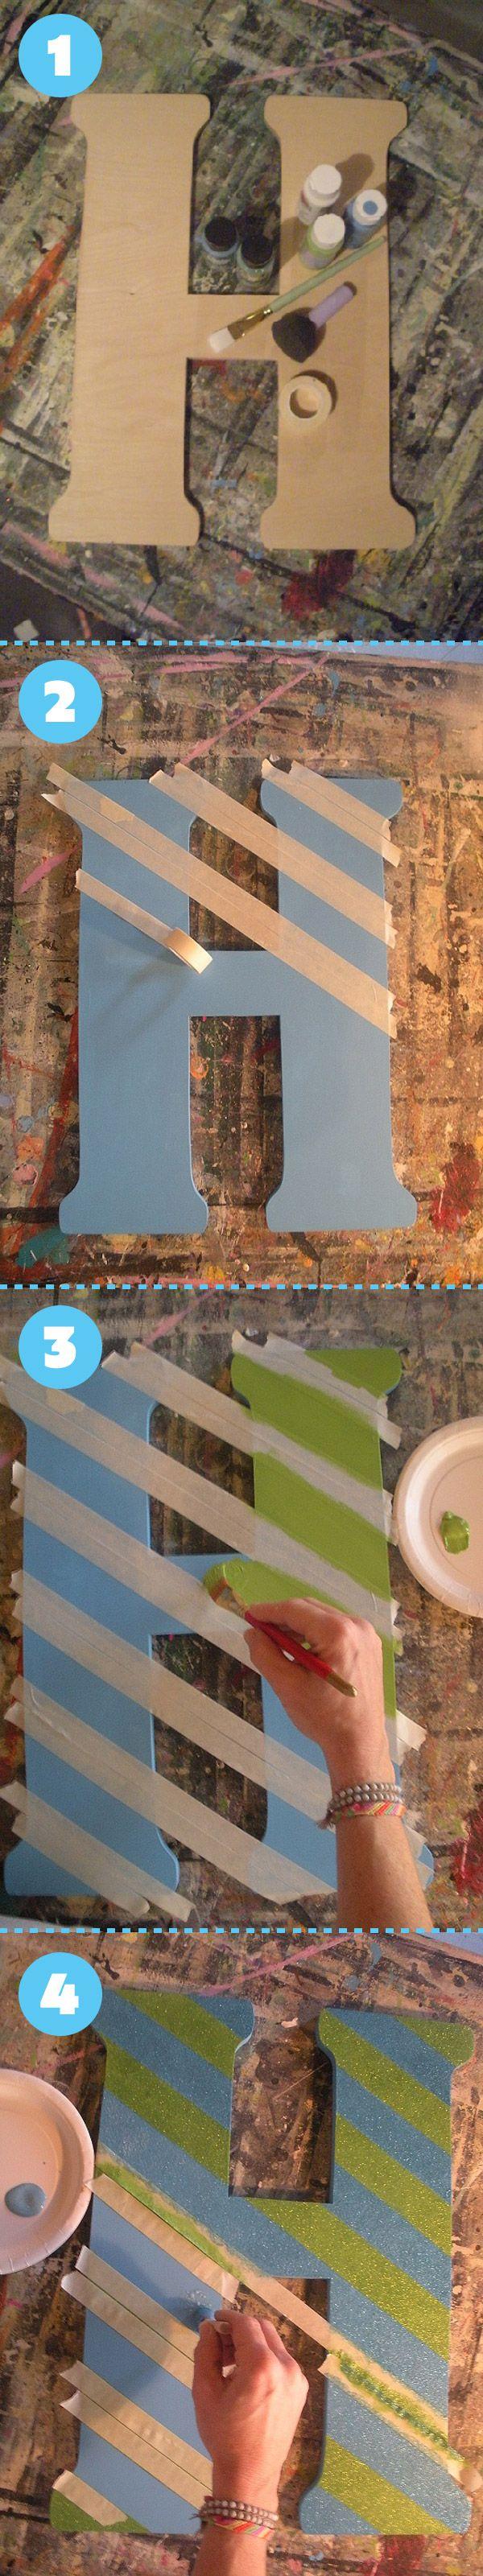 H-PhotoSet.Oversized Wood Letters: flasHy